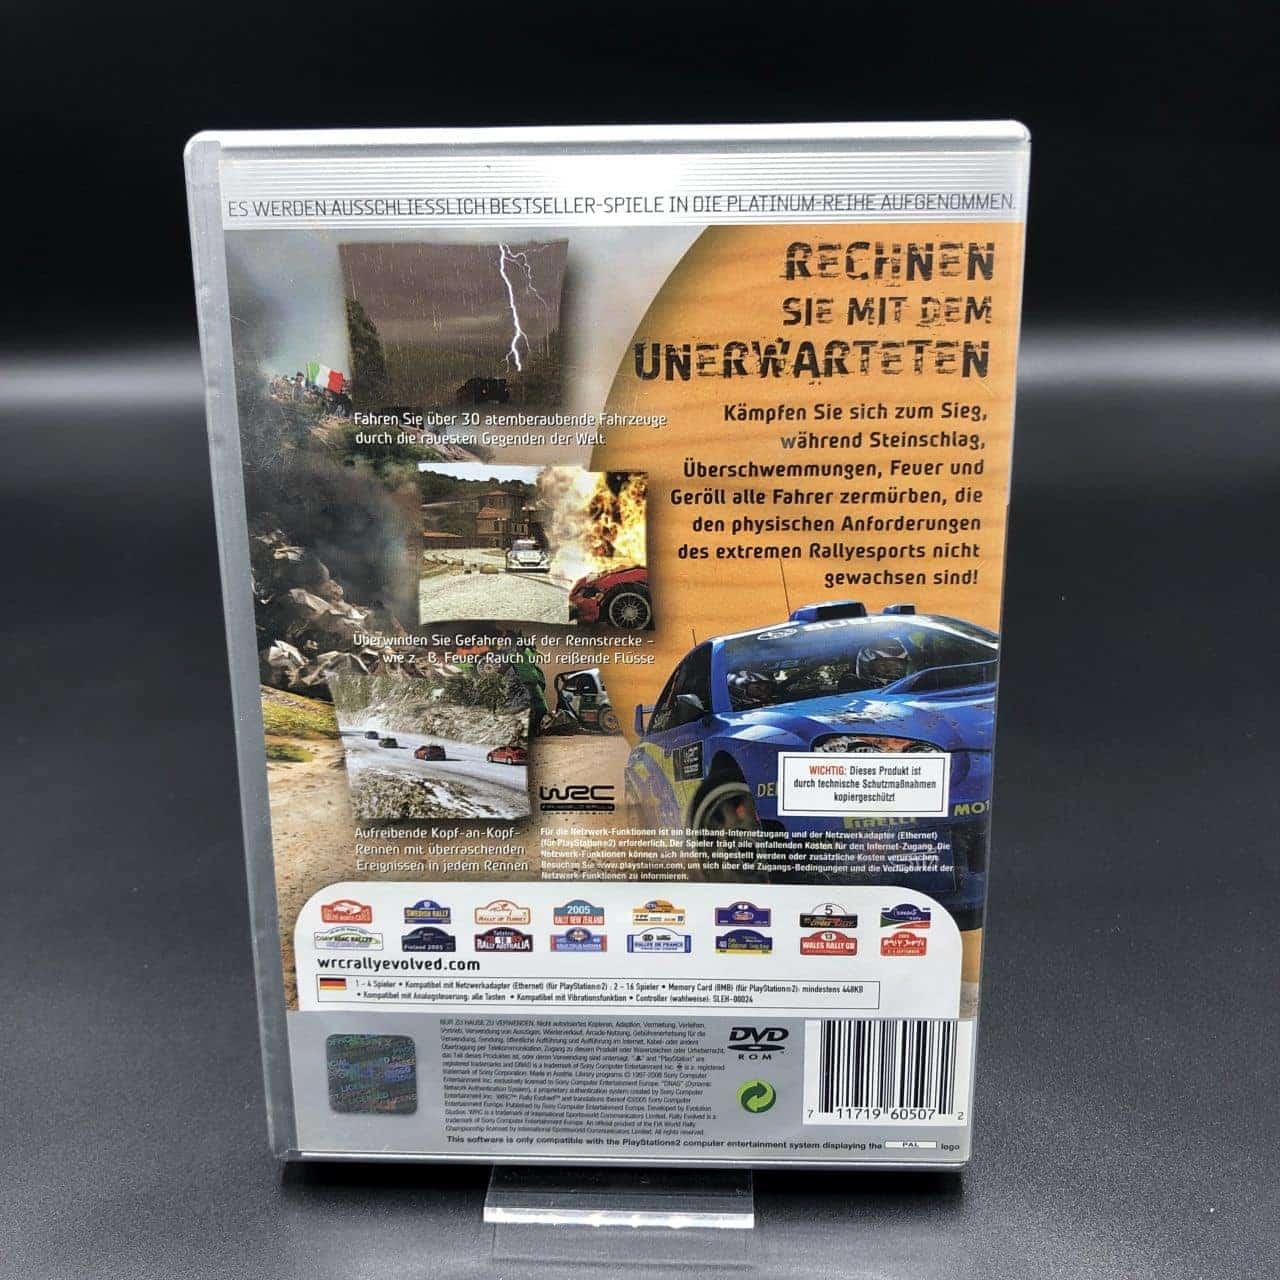 PS2 WRC: Rally Evolved (Platinum) (Komplett) (Gebrauchsspuren) Sony PlayStation 2